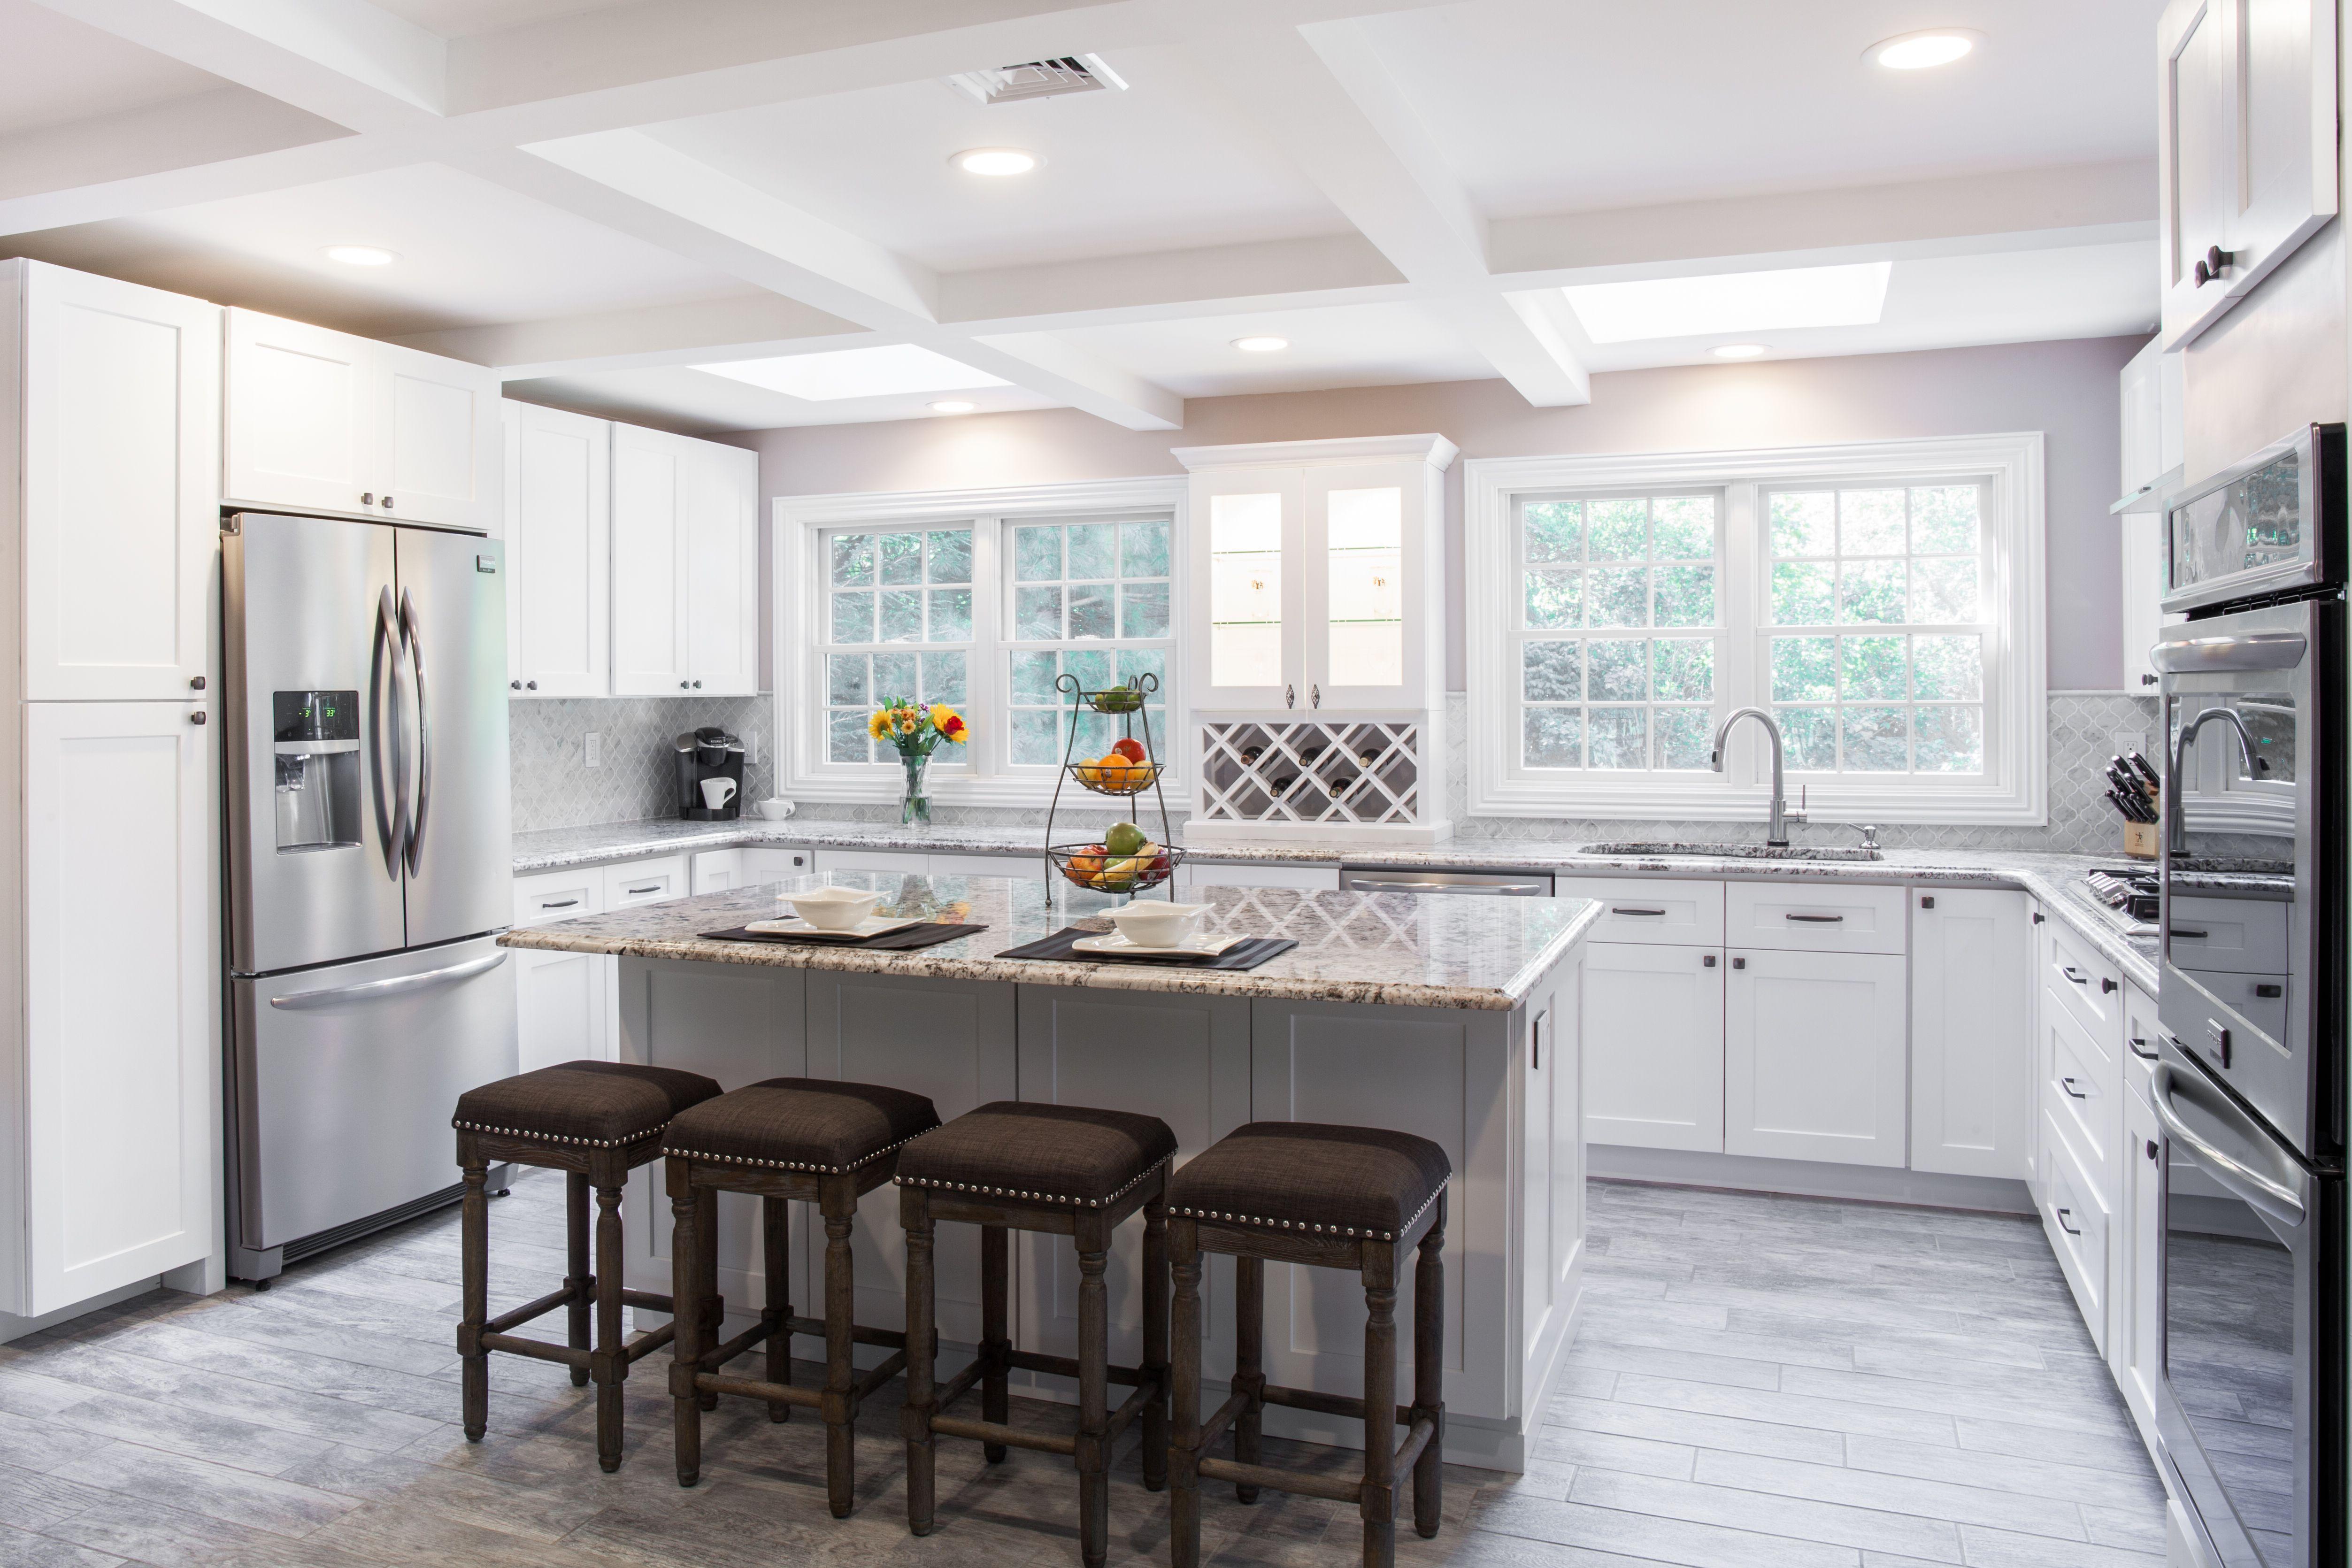 Home Cabinet Westbury S8 Style White Maple Kitchen Cabinets Door